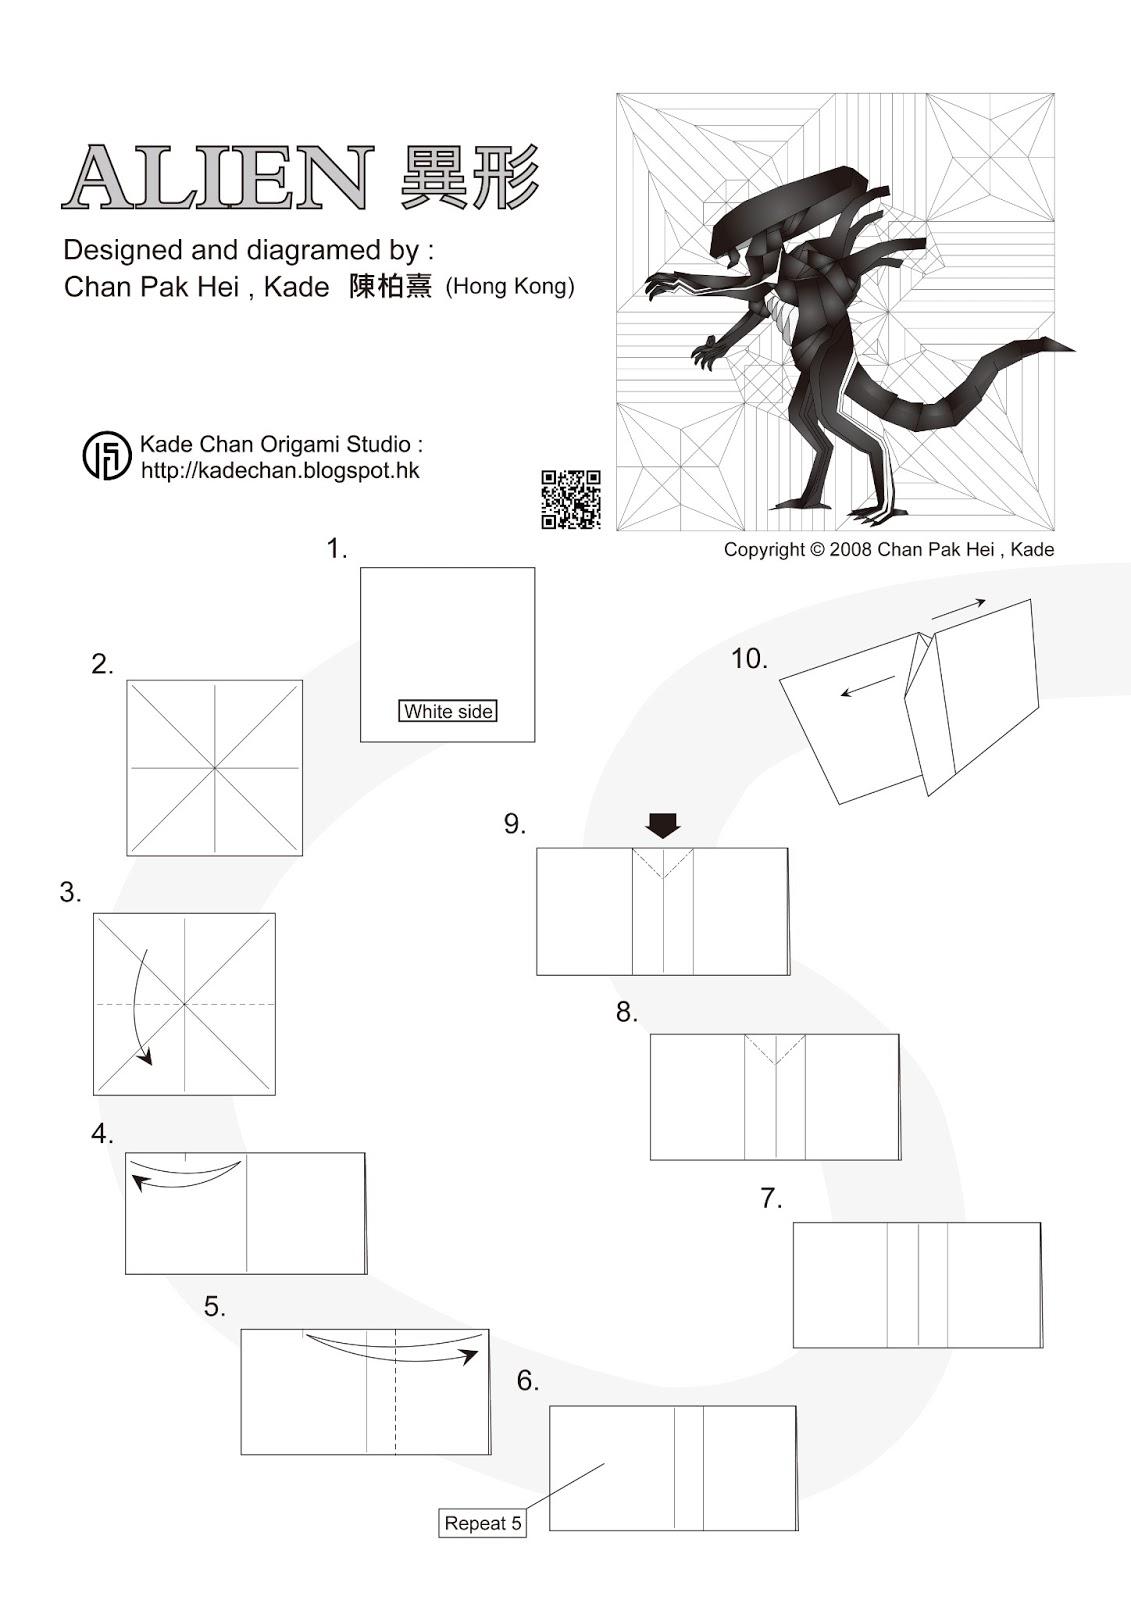 Kade Chan Origami Diagrams Opinions About Wiring Diagram Koi Blog Alien Tutorial Rh Kadechan Blogspot Com